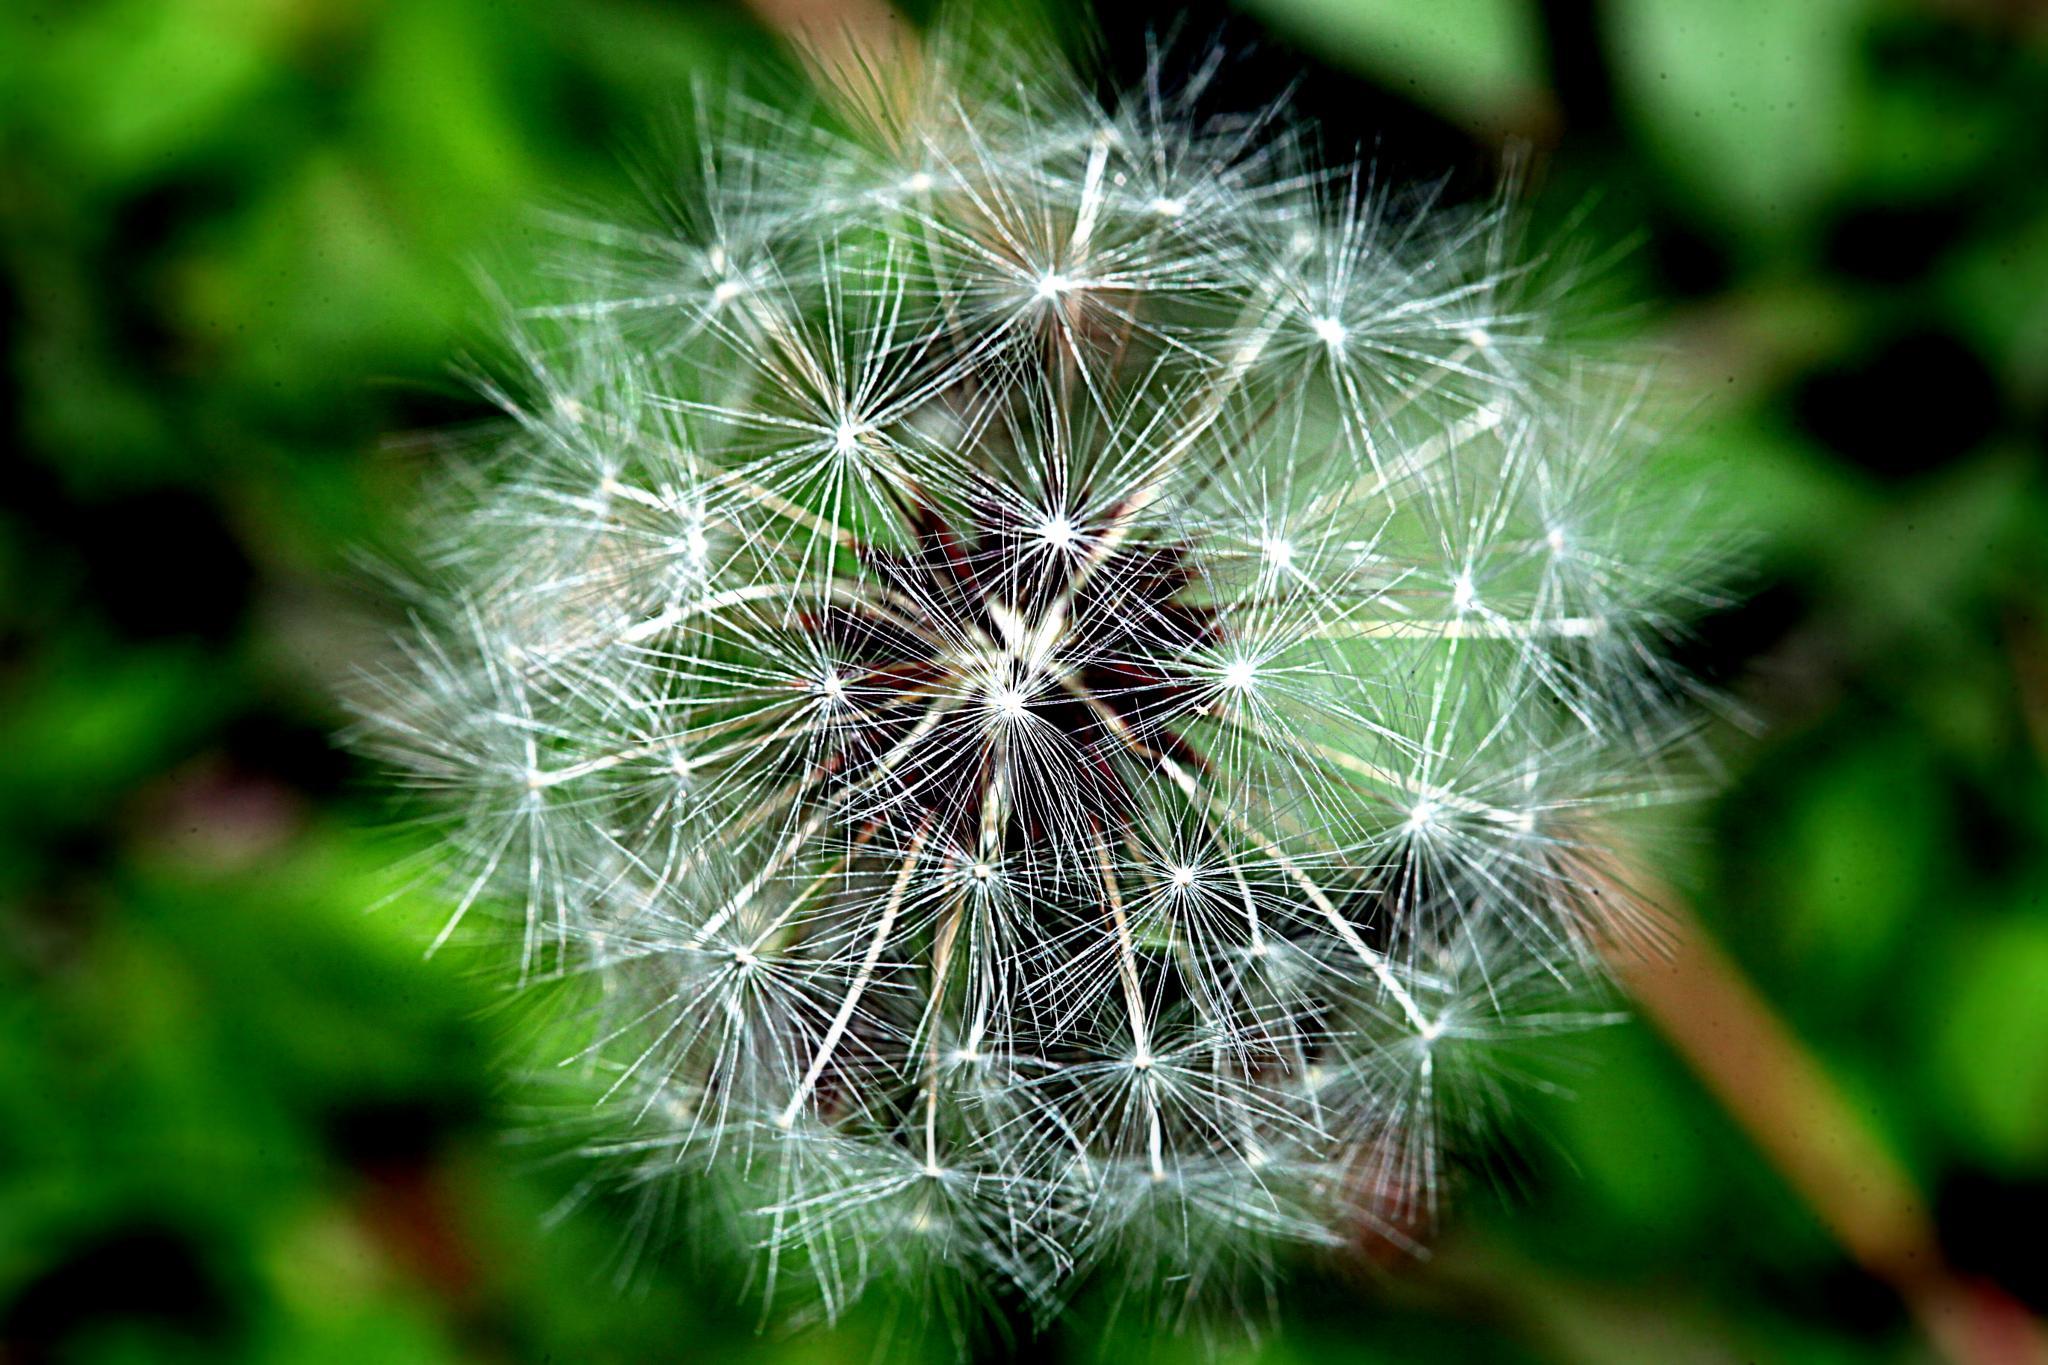 Dandelion by Christo Smith